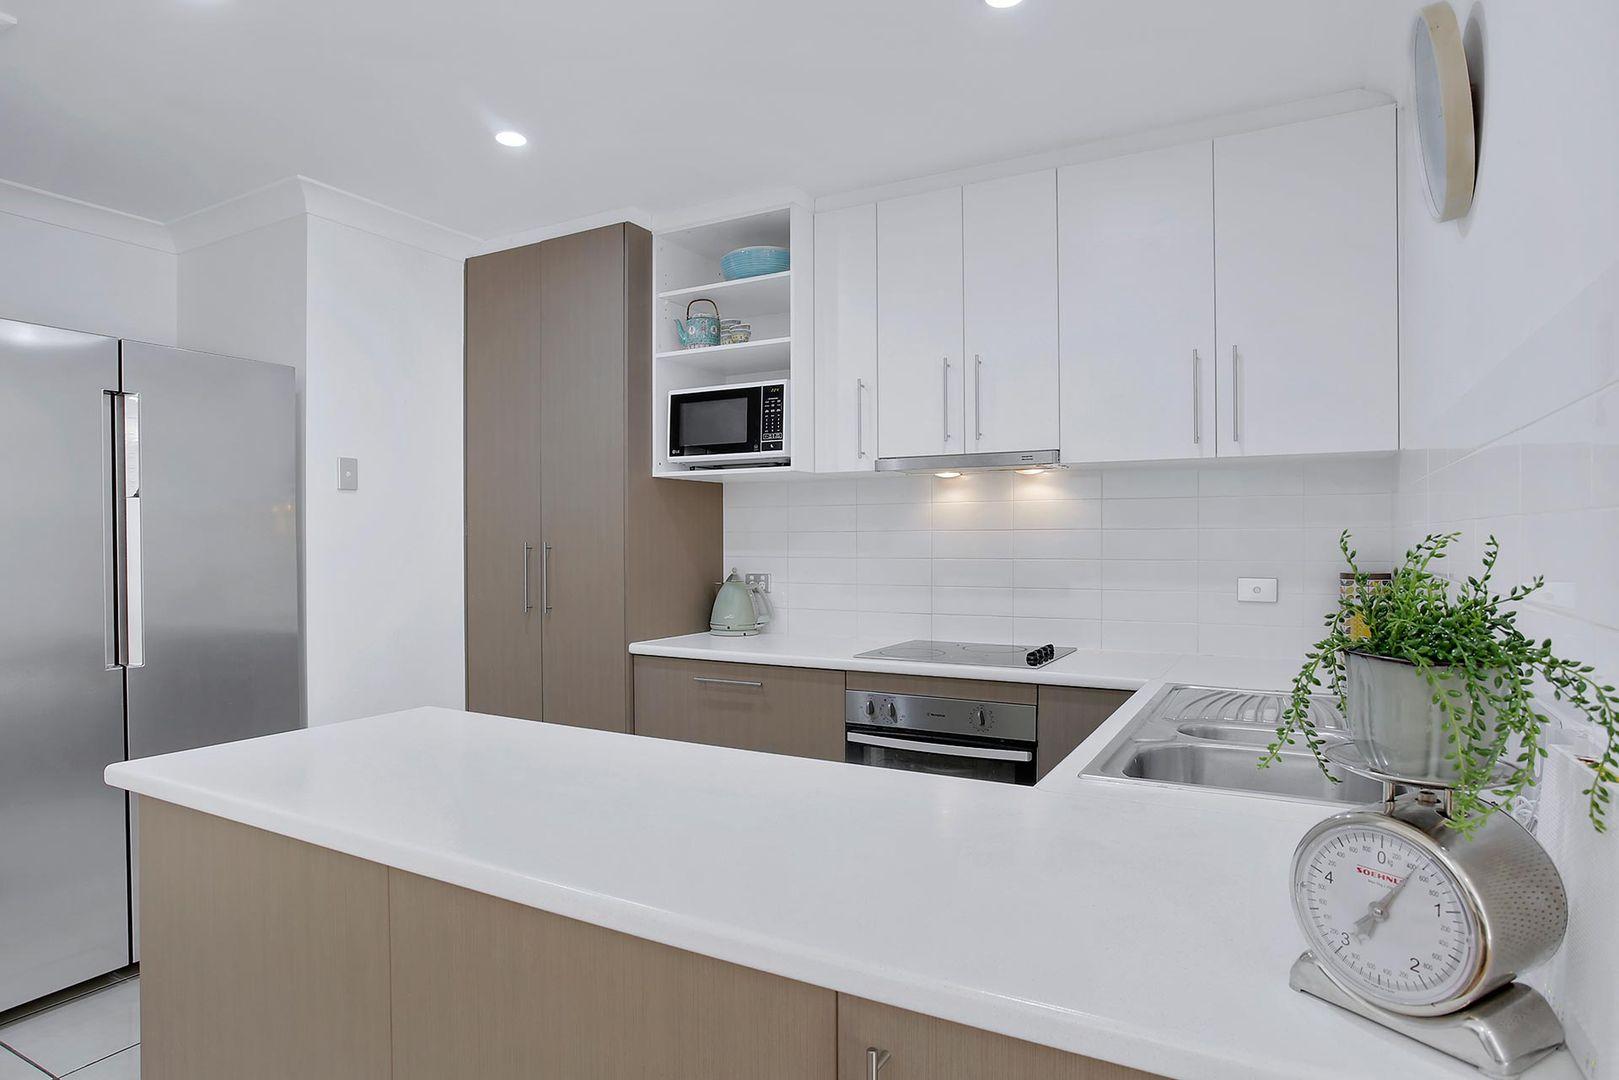 11/50 Ryans Road, Northgate QLD 4013, Image 2